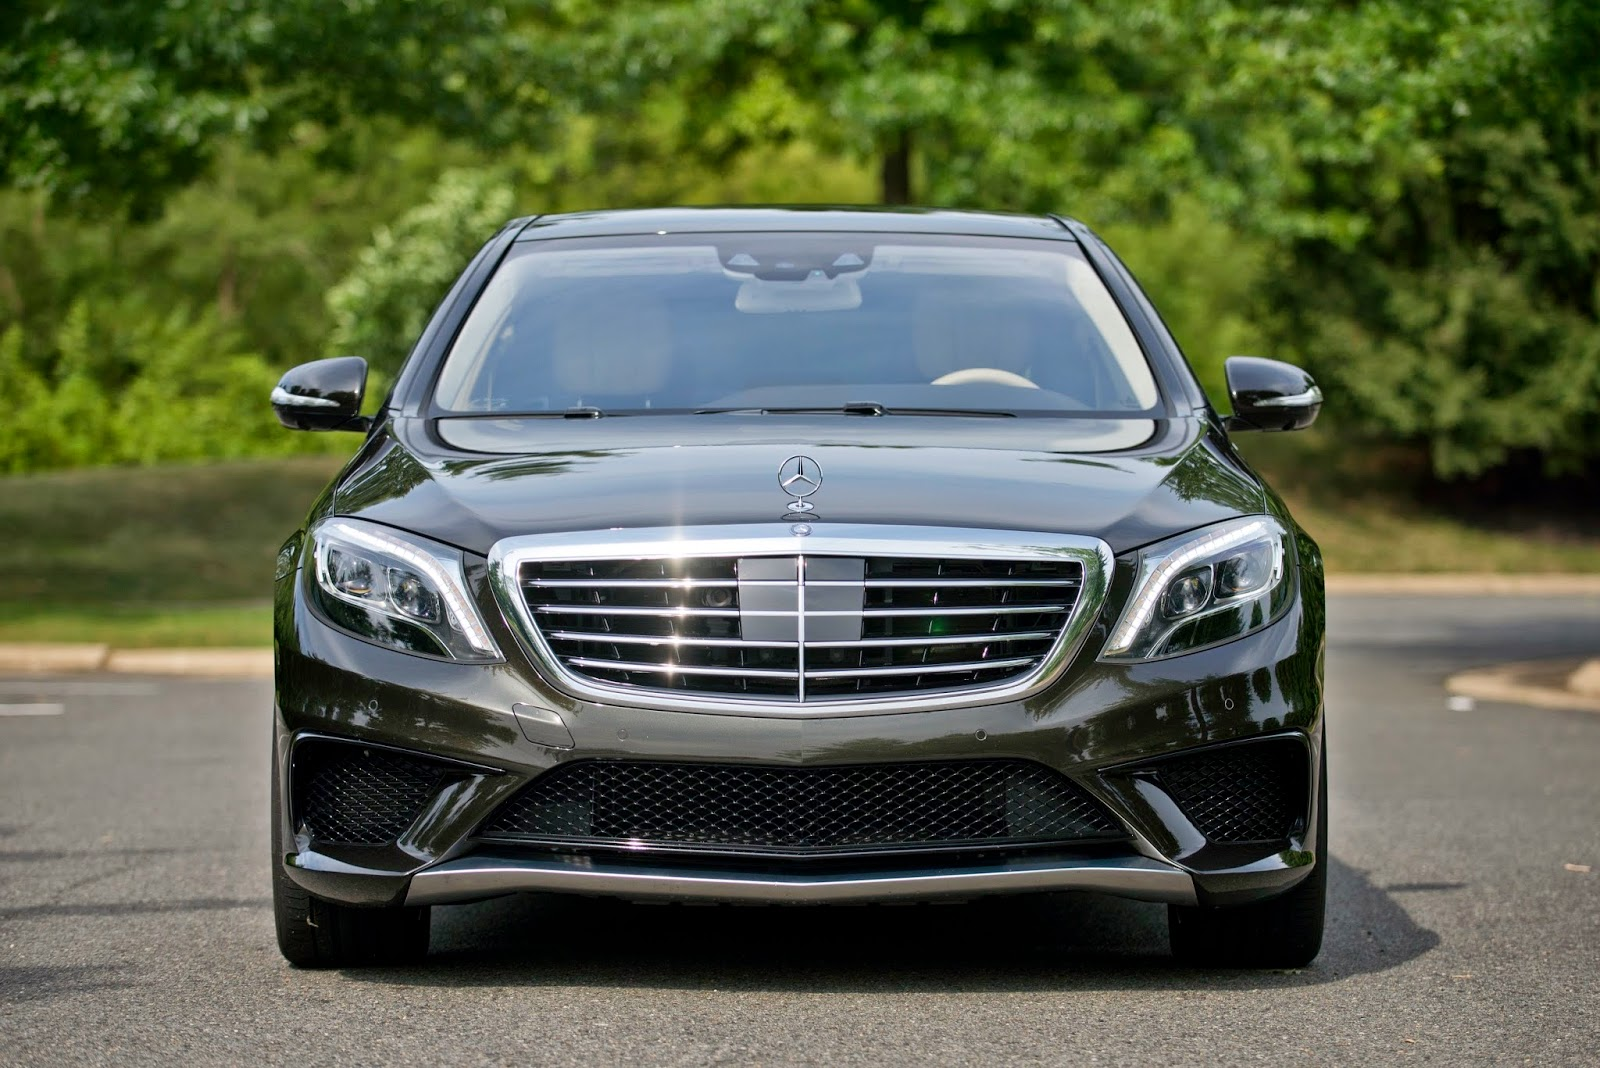 Automotiveblogz 2014 mercedes benz s63 amg 4matic sedan for Mercedes benz amg s63